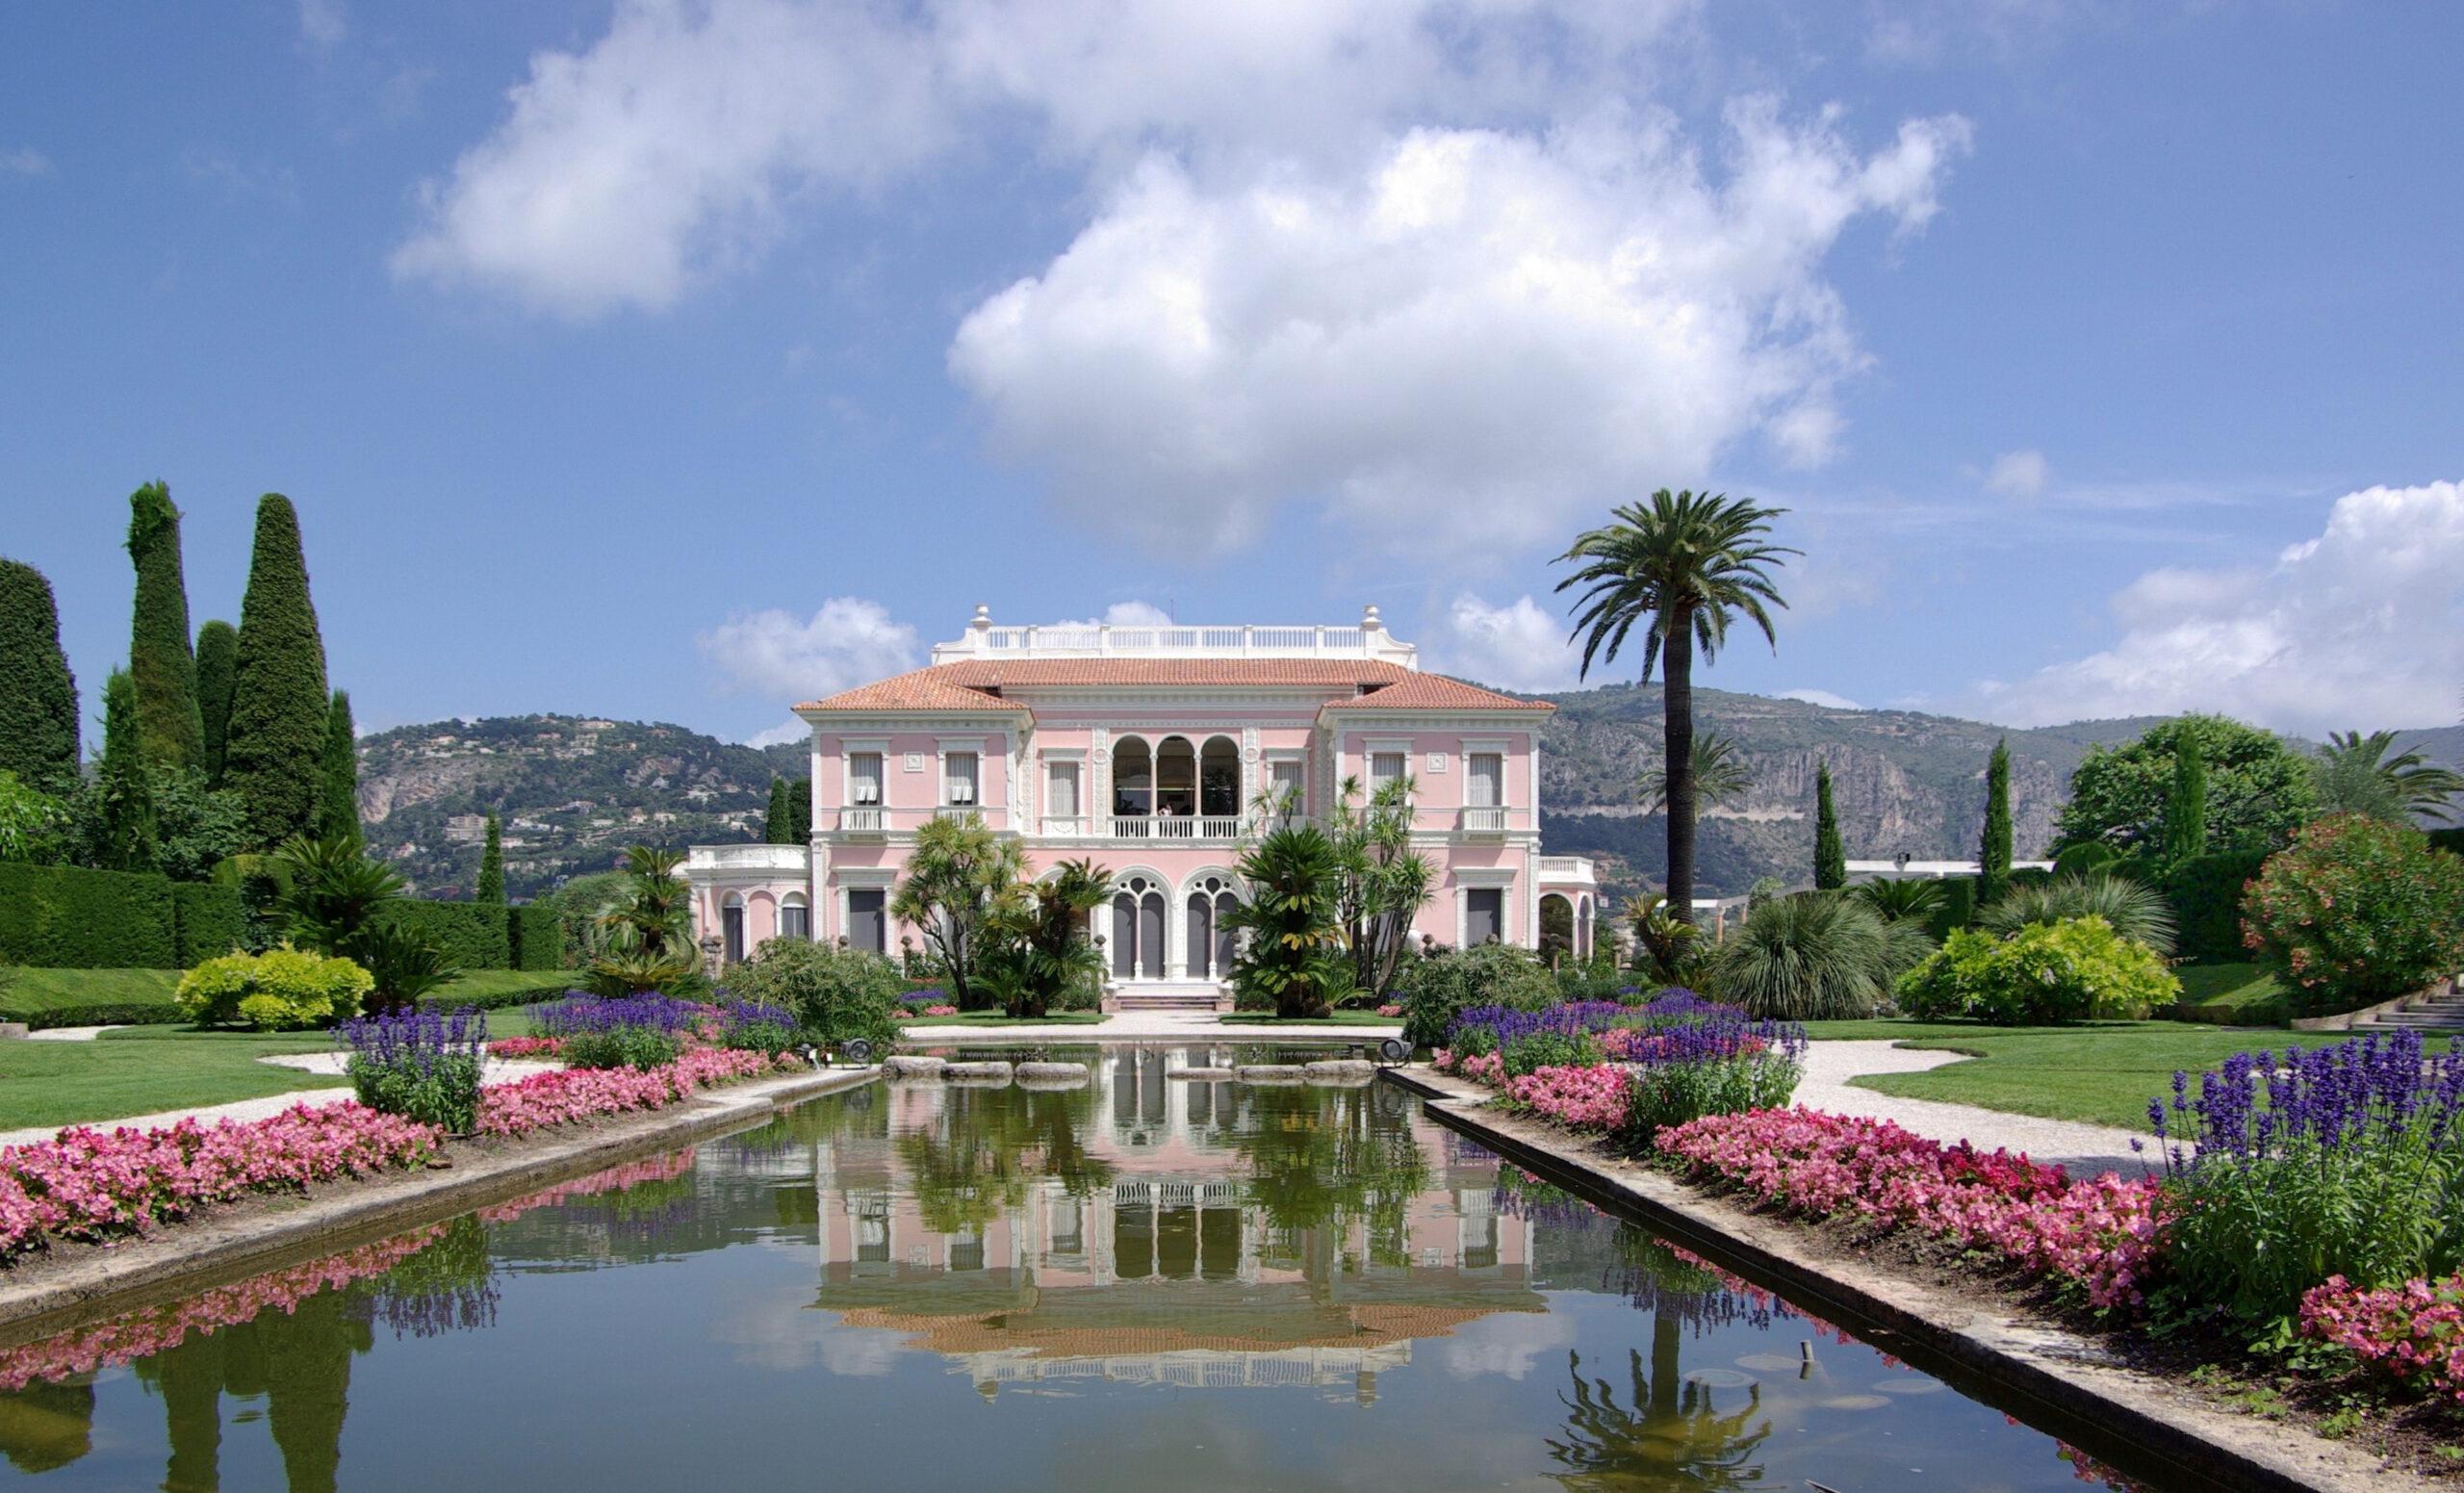 Villa Ephrussi de Rothschild: l'arte del '700 in una residenza Belle-Epoque